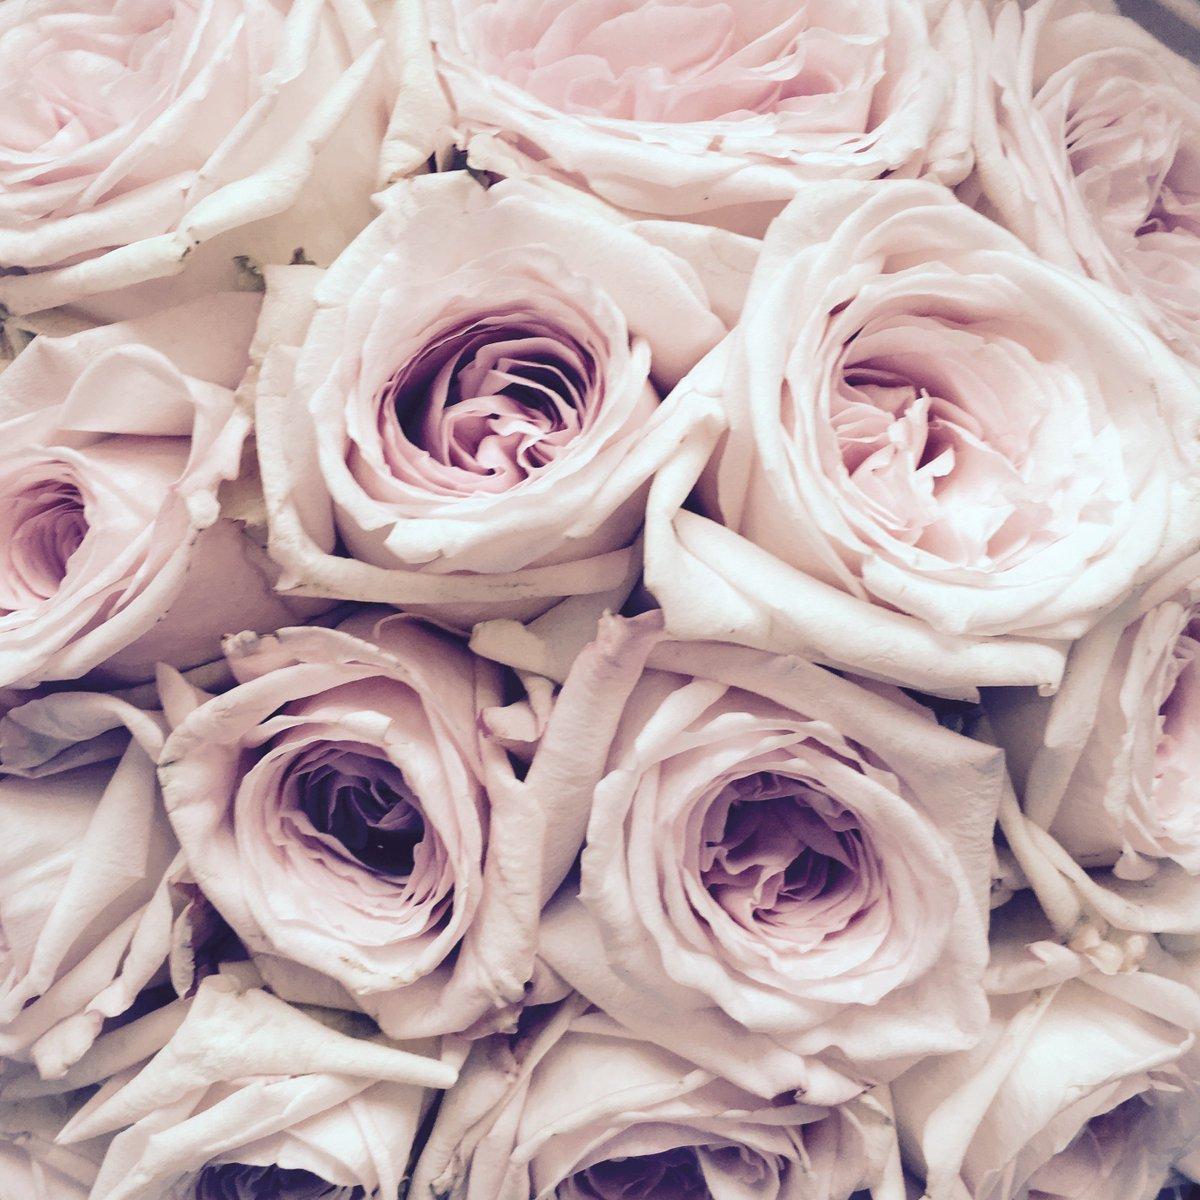 Ring a ring o' roses... x Stella https://t.co/w0yG7jOfHN